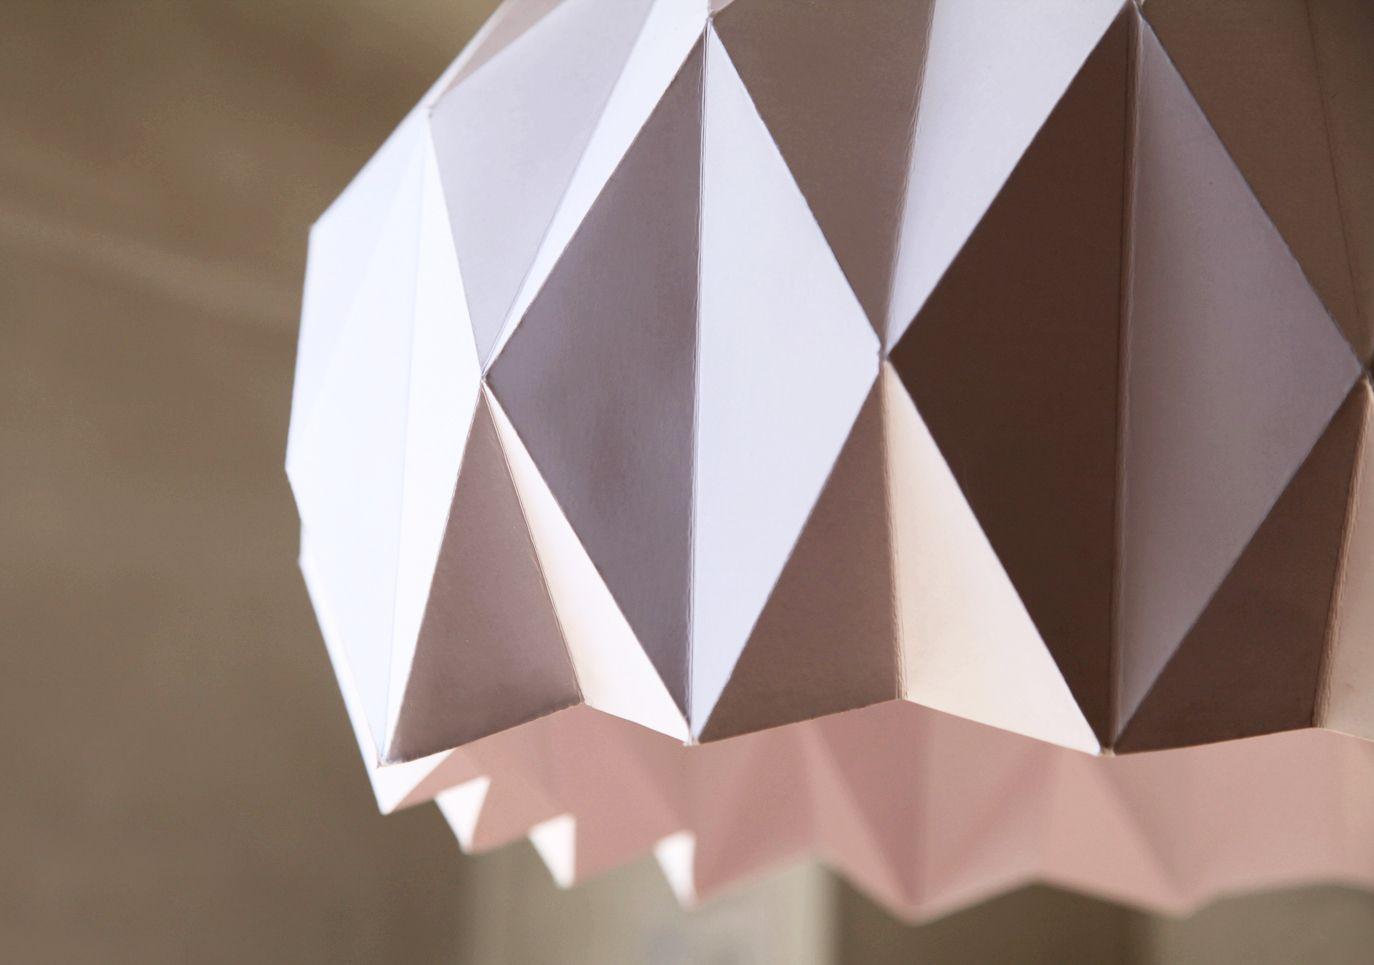 dyi origami pendant lamp lemonrock diy must do. Black Bedroom Furniture Sets. Home Design Ideas